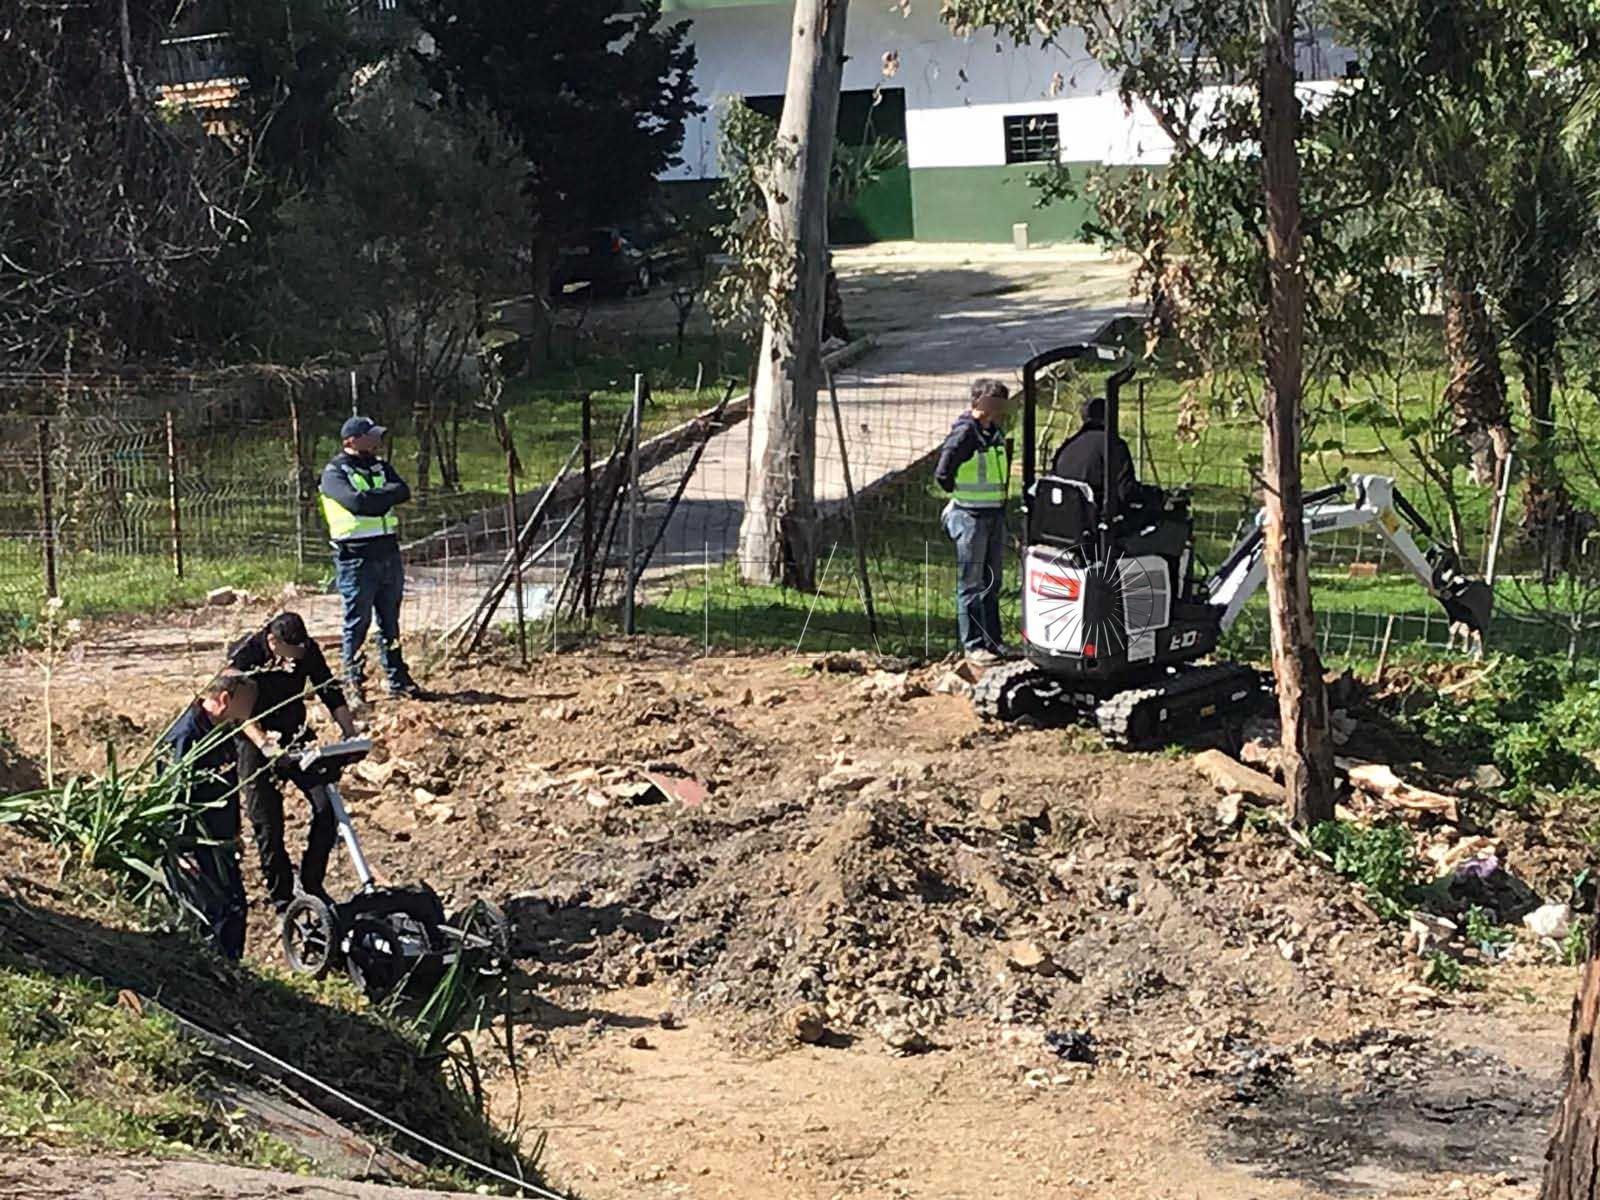 policia-operacion-busqueda-armas-7